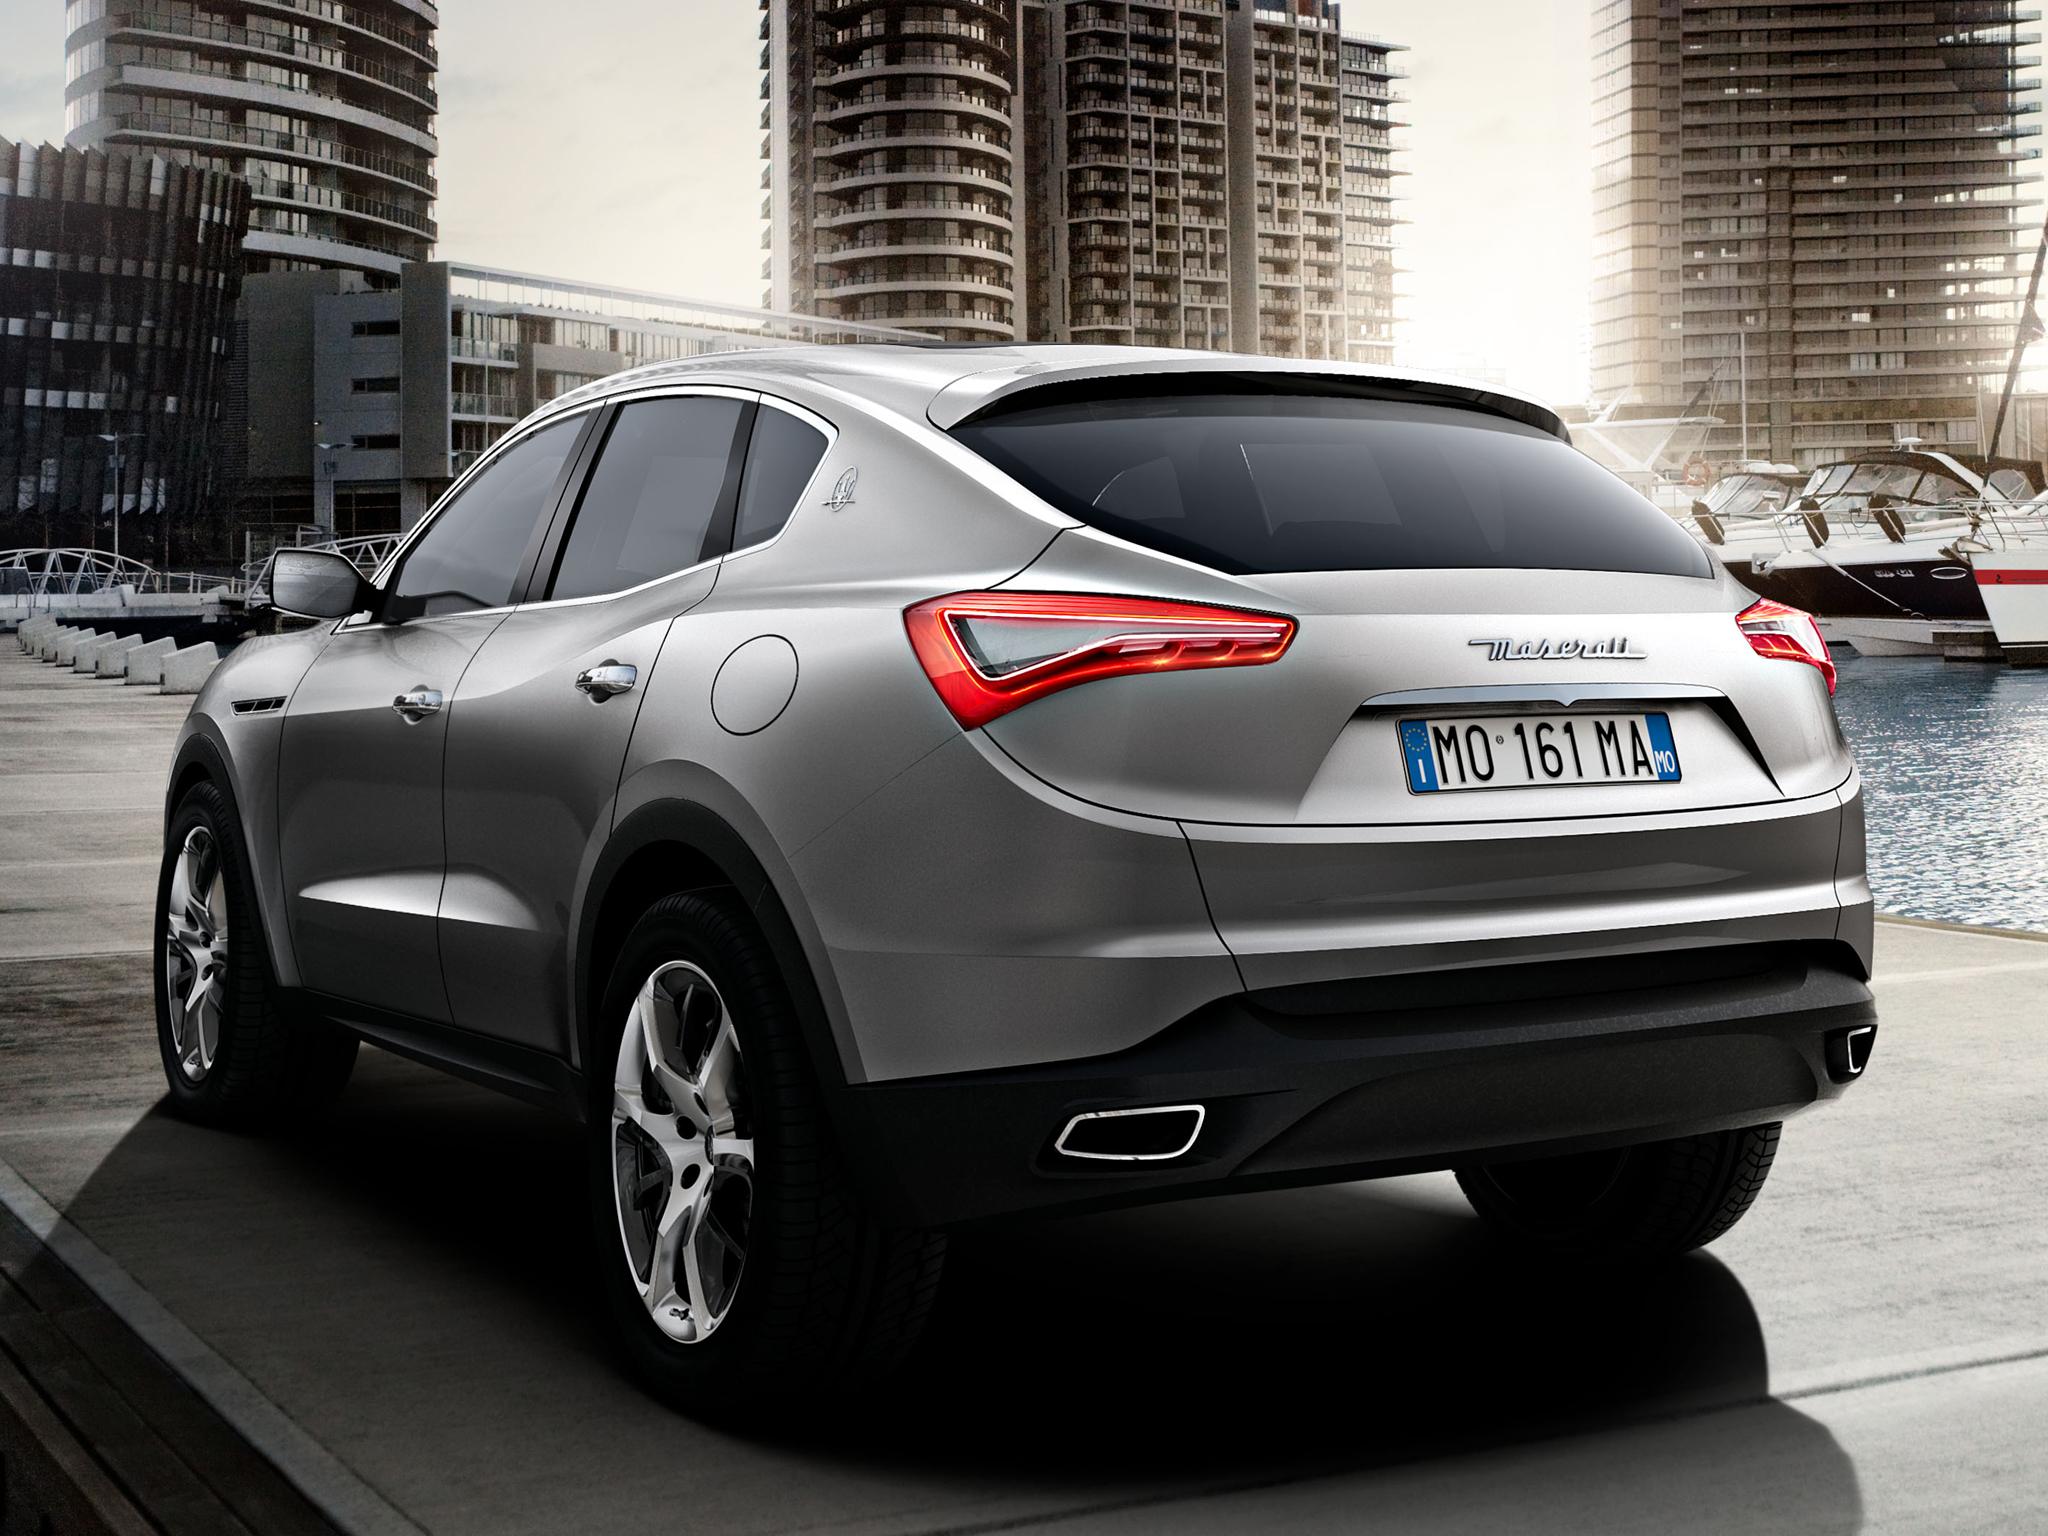 De Maserati Kubang Concept, zoals voorgesteld in 2011. Foto: Maserati